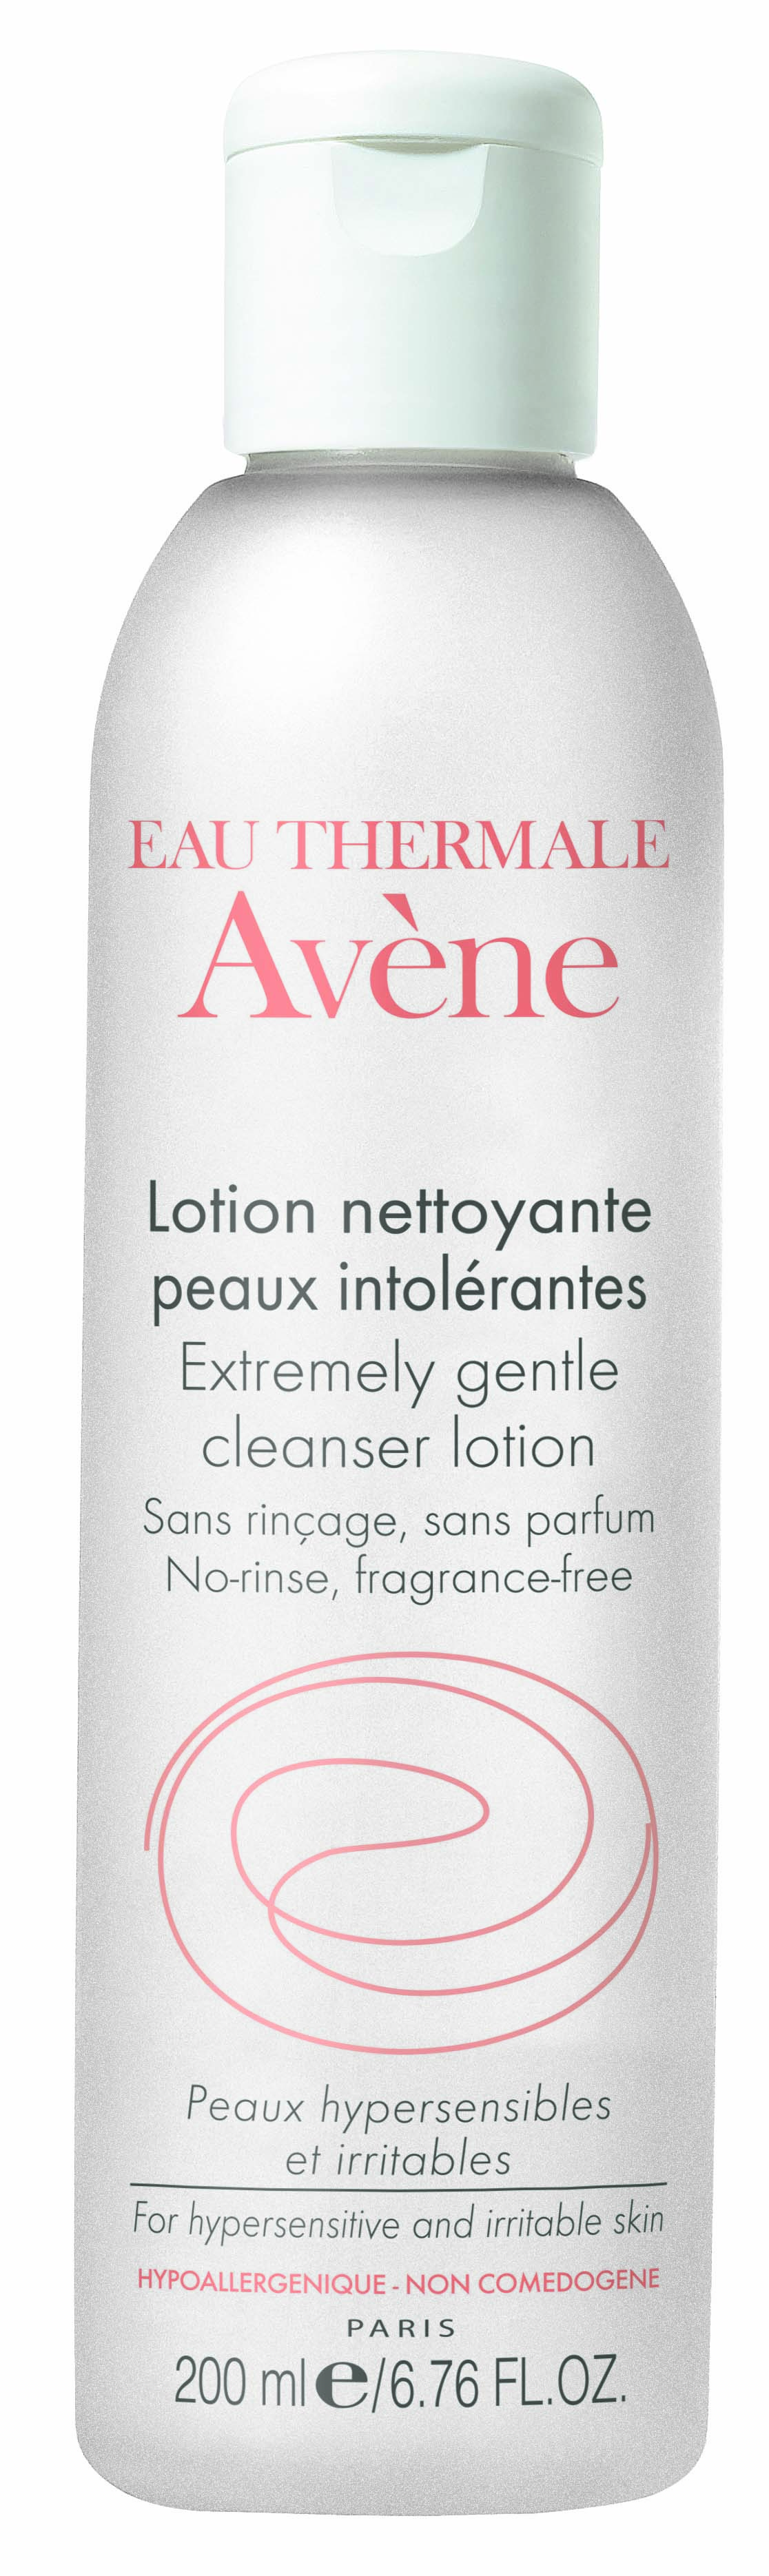 AVENE (Pierre Fabre It. SpA) Avene Lozione Detergente Pelli Intolleranti 200ml